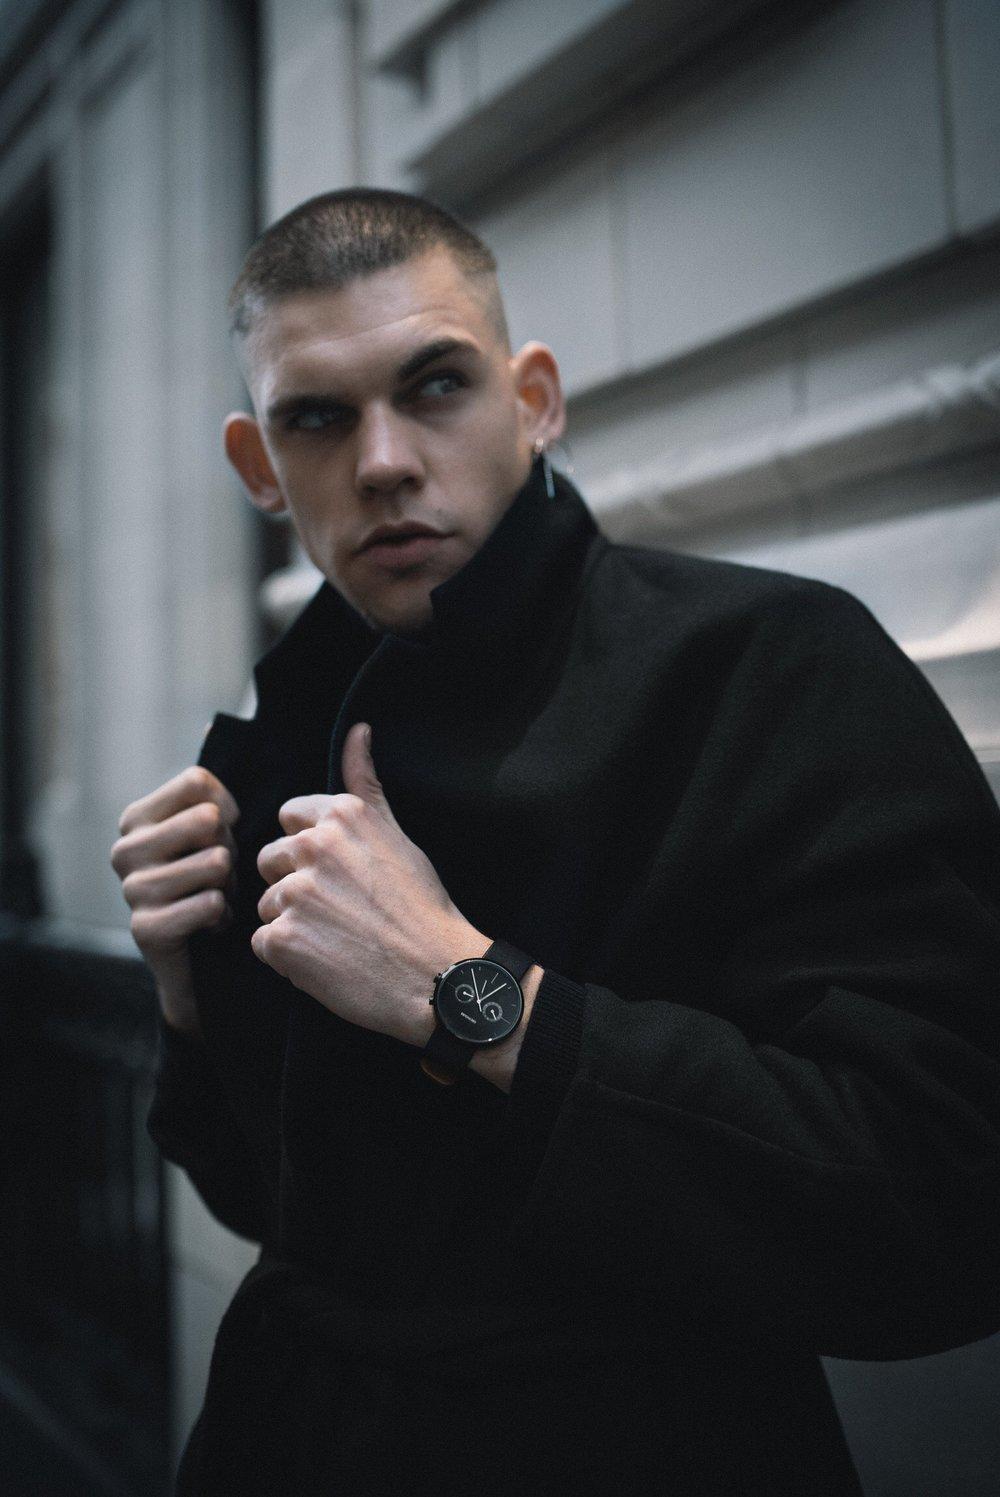 'Time Killer' - GreyHours Stylist & Model